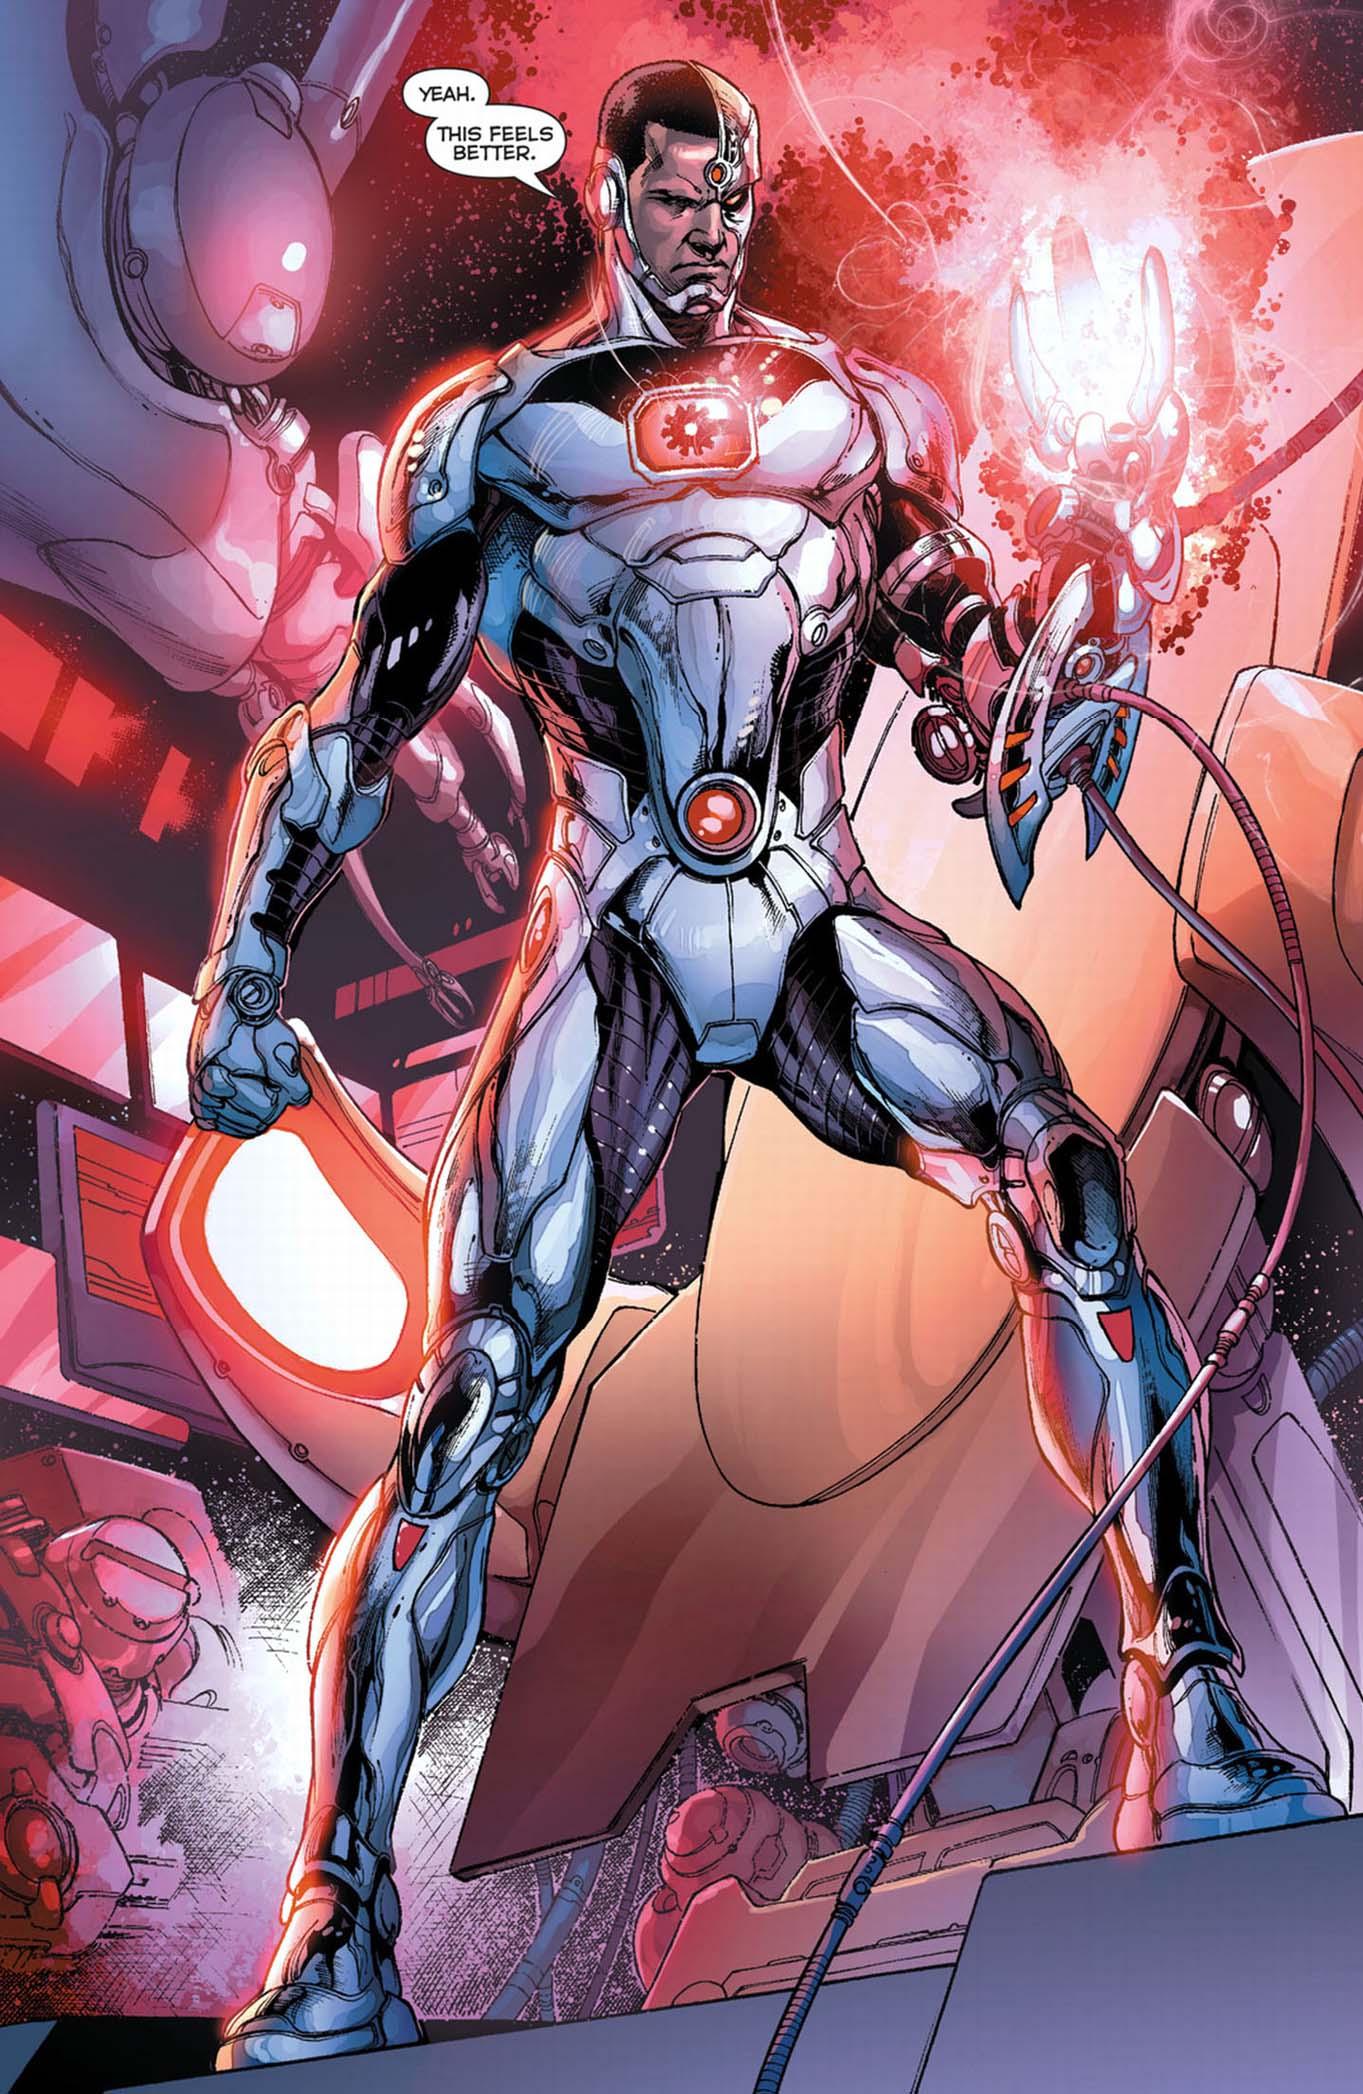 https://comicnewbies.files.wordpress.com/2014/02/cyborg-version-2-new-52.jpg